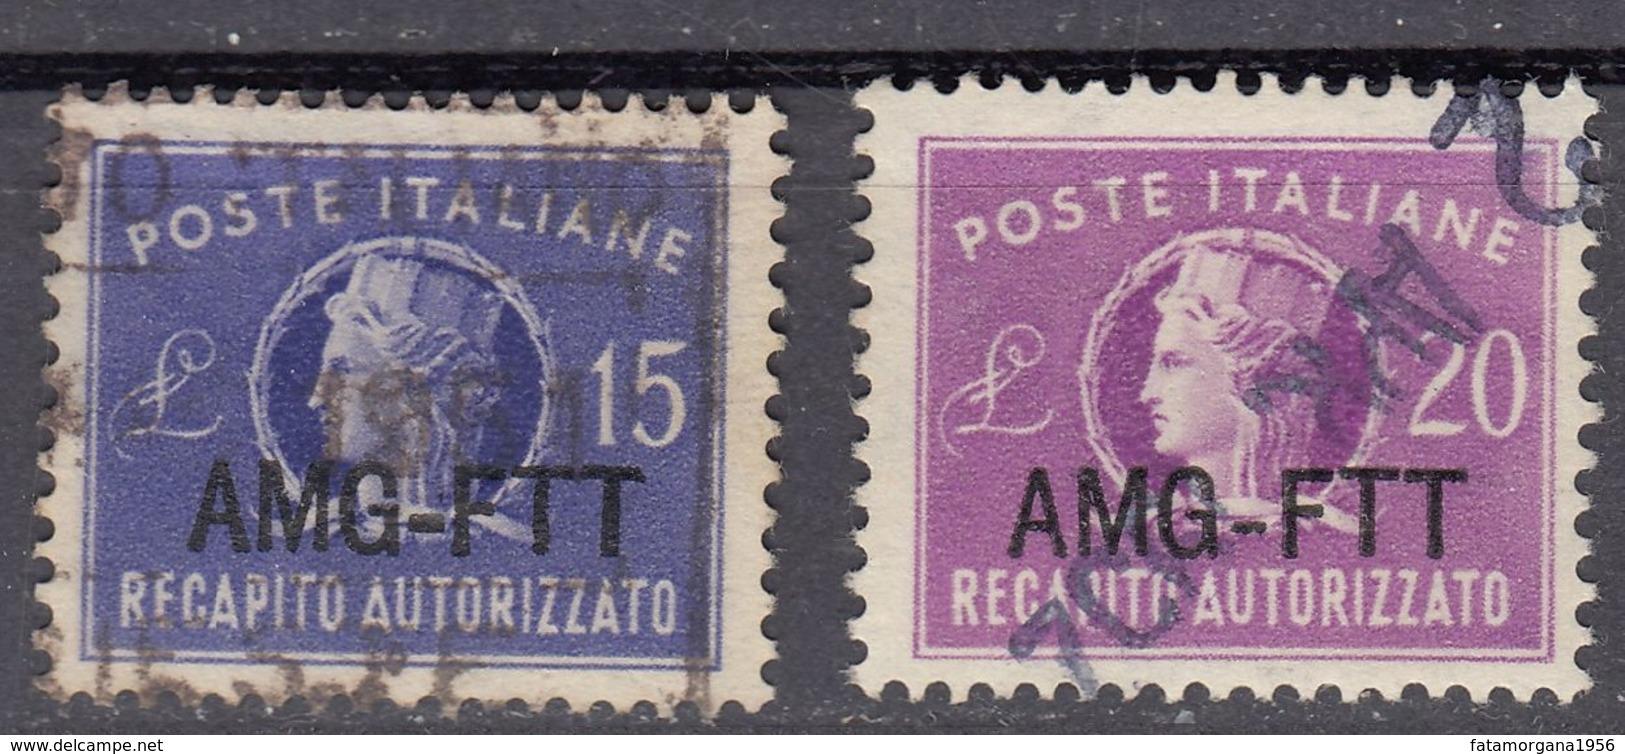 TRIESTE  Zona A AMG-FTT - 1949/1954 - Serie Completa Usata Recapito Autorizzato Yvert 9/10. - Eilsendung (Eilpost)